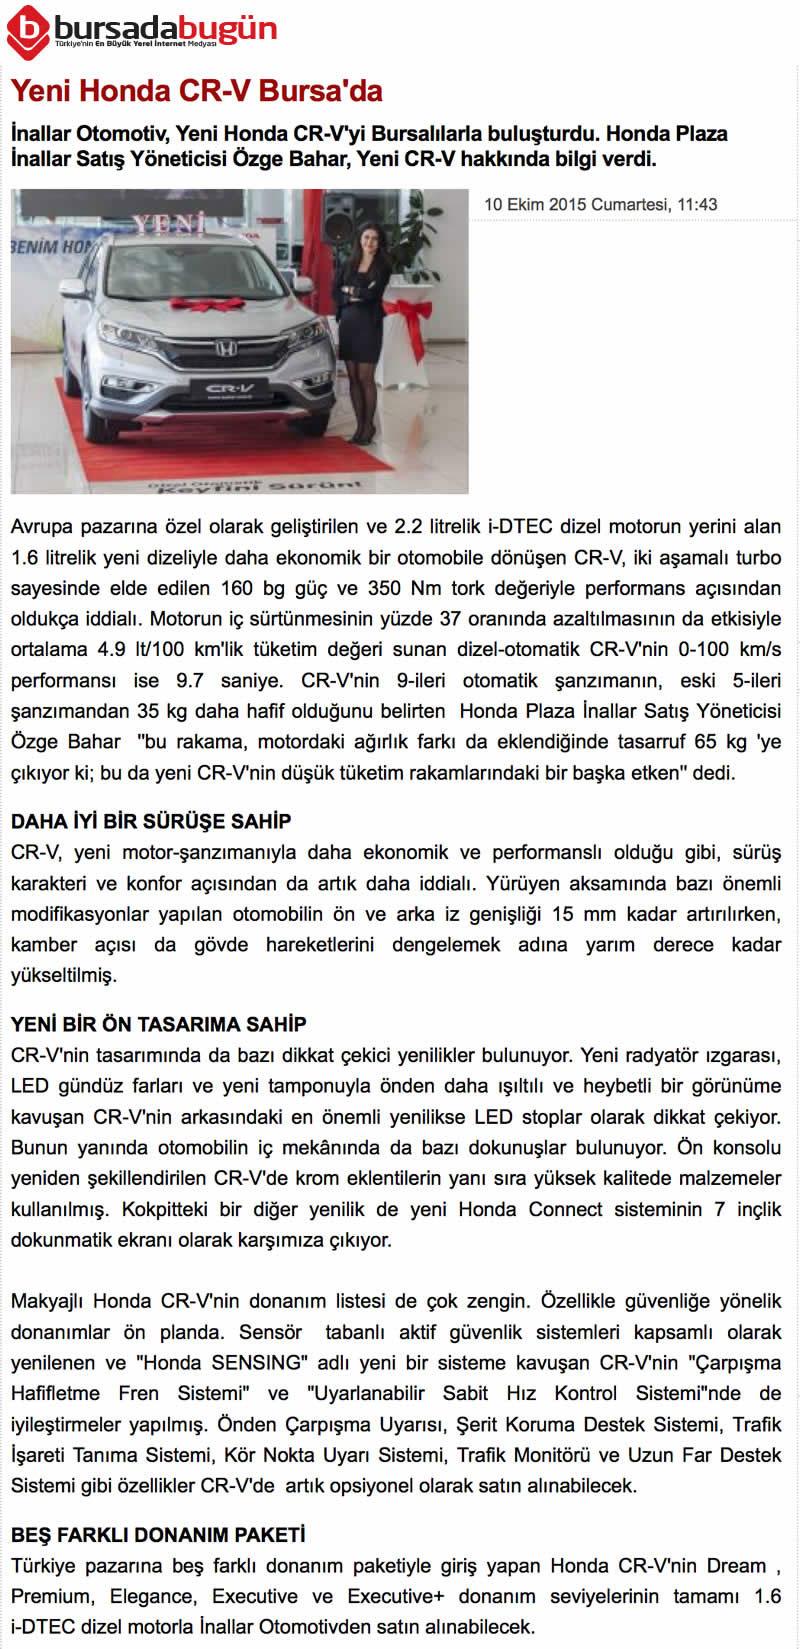 Bursadabugun.com